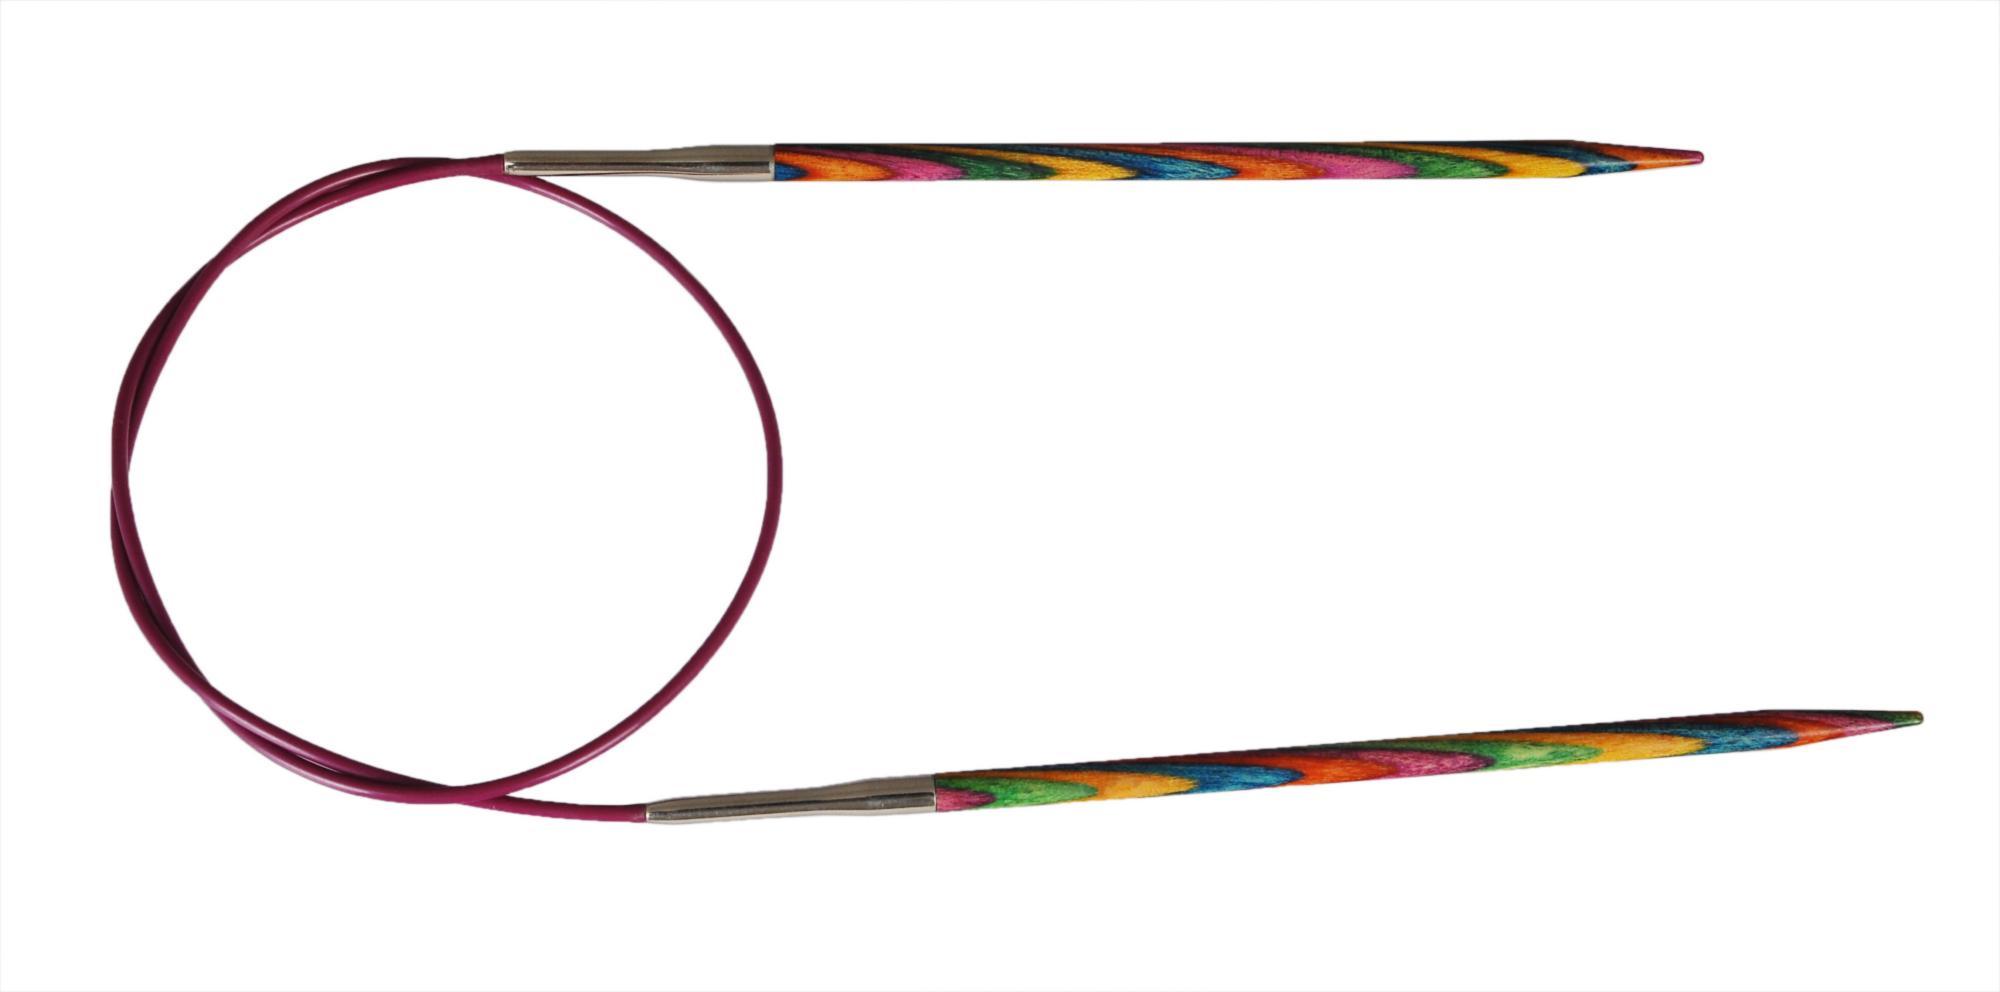 Спицы круговые 50 см Symfonie Wood KnitPro, 20397, 8.00 мм